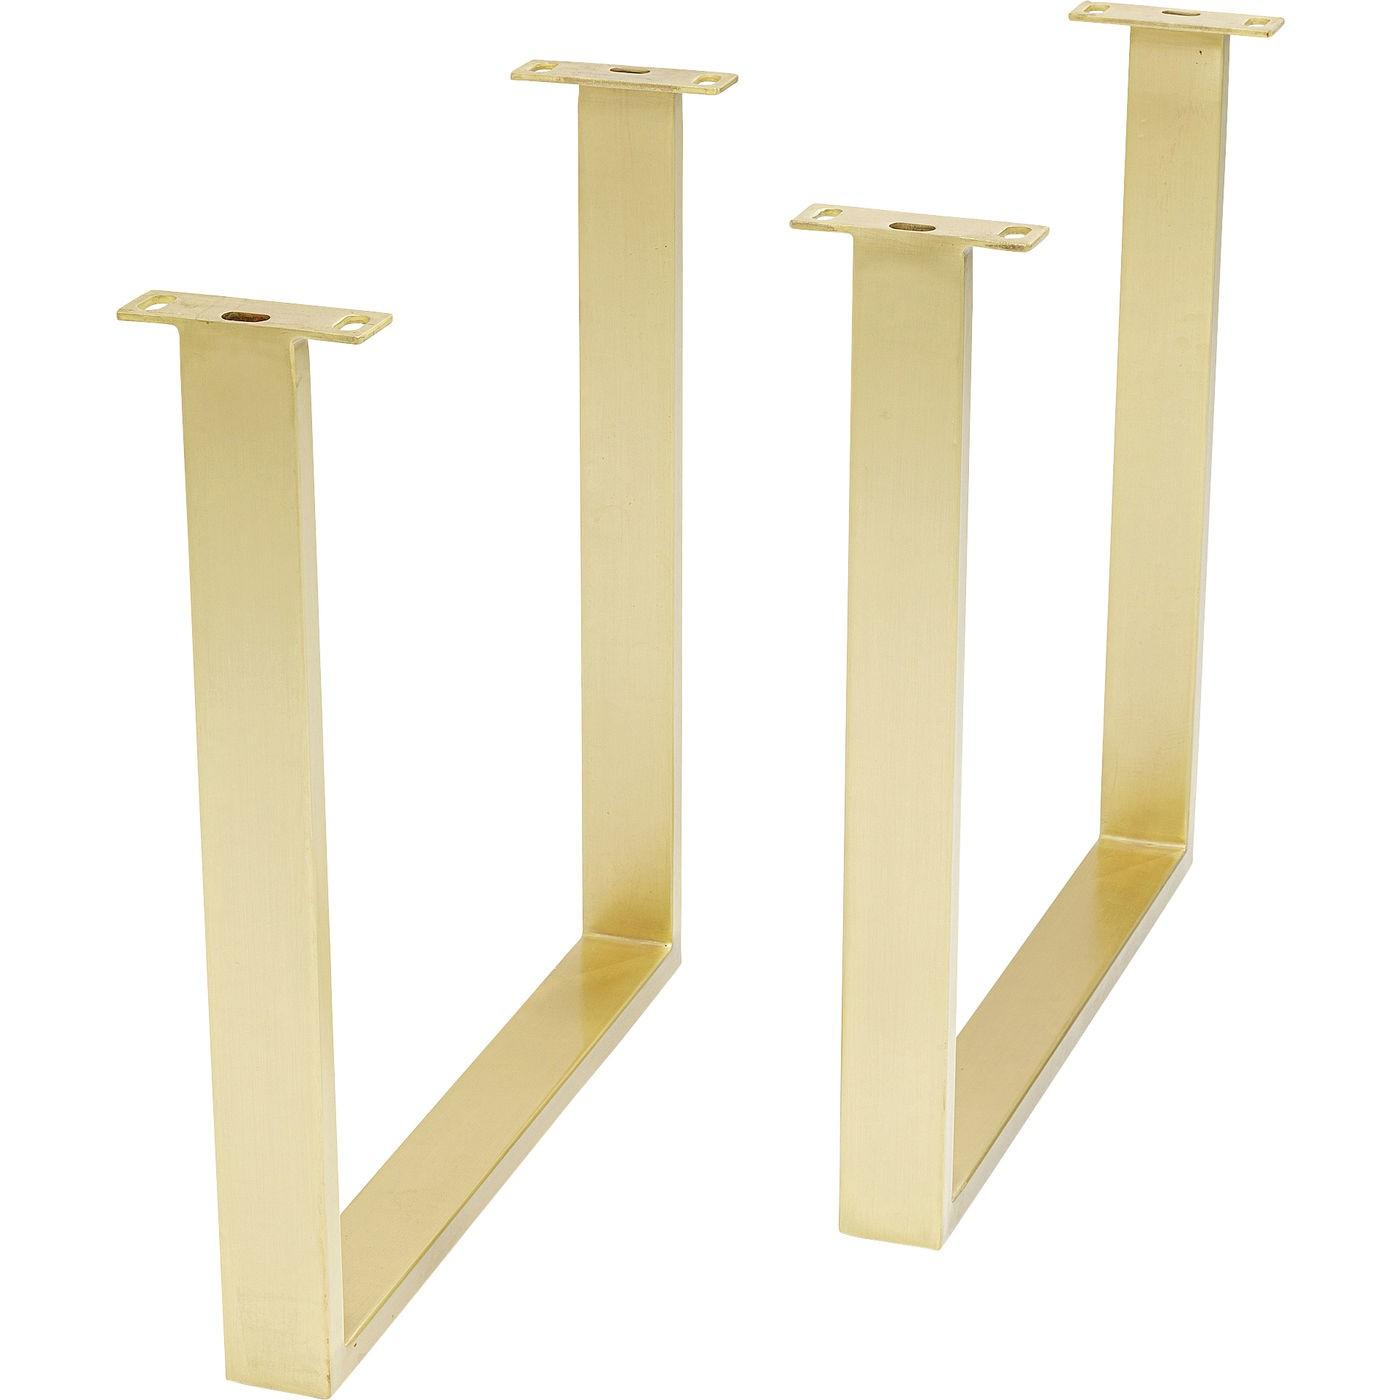 Table Symphony chêne laiton 200x100cm Kare Design